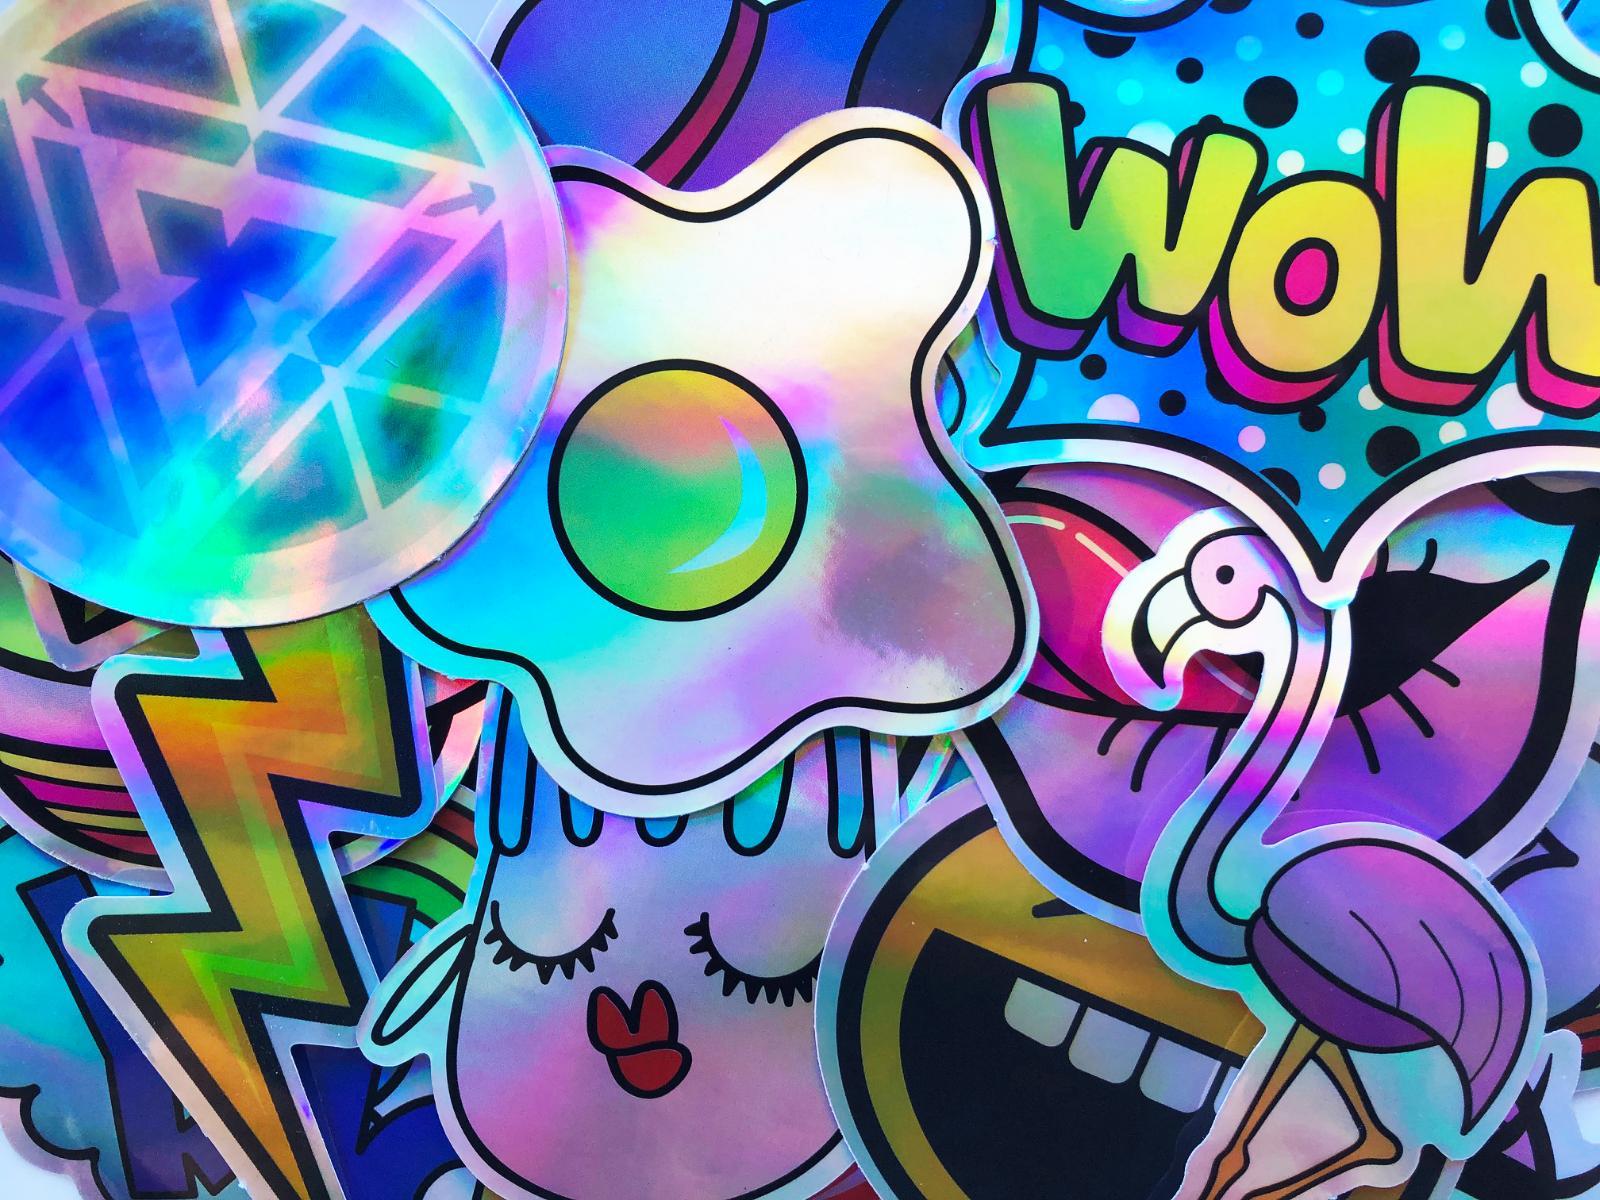 20 Shiny Reflective Graffiti Cool Stickers Decals